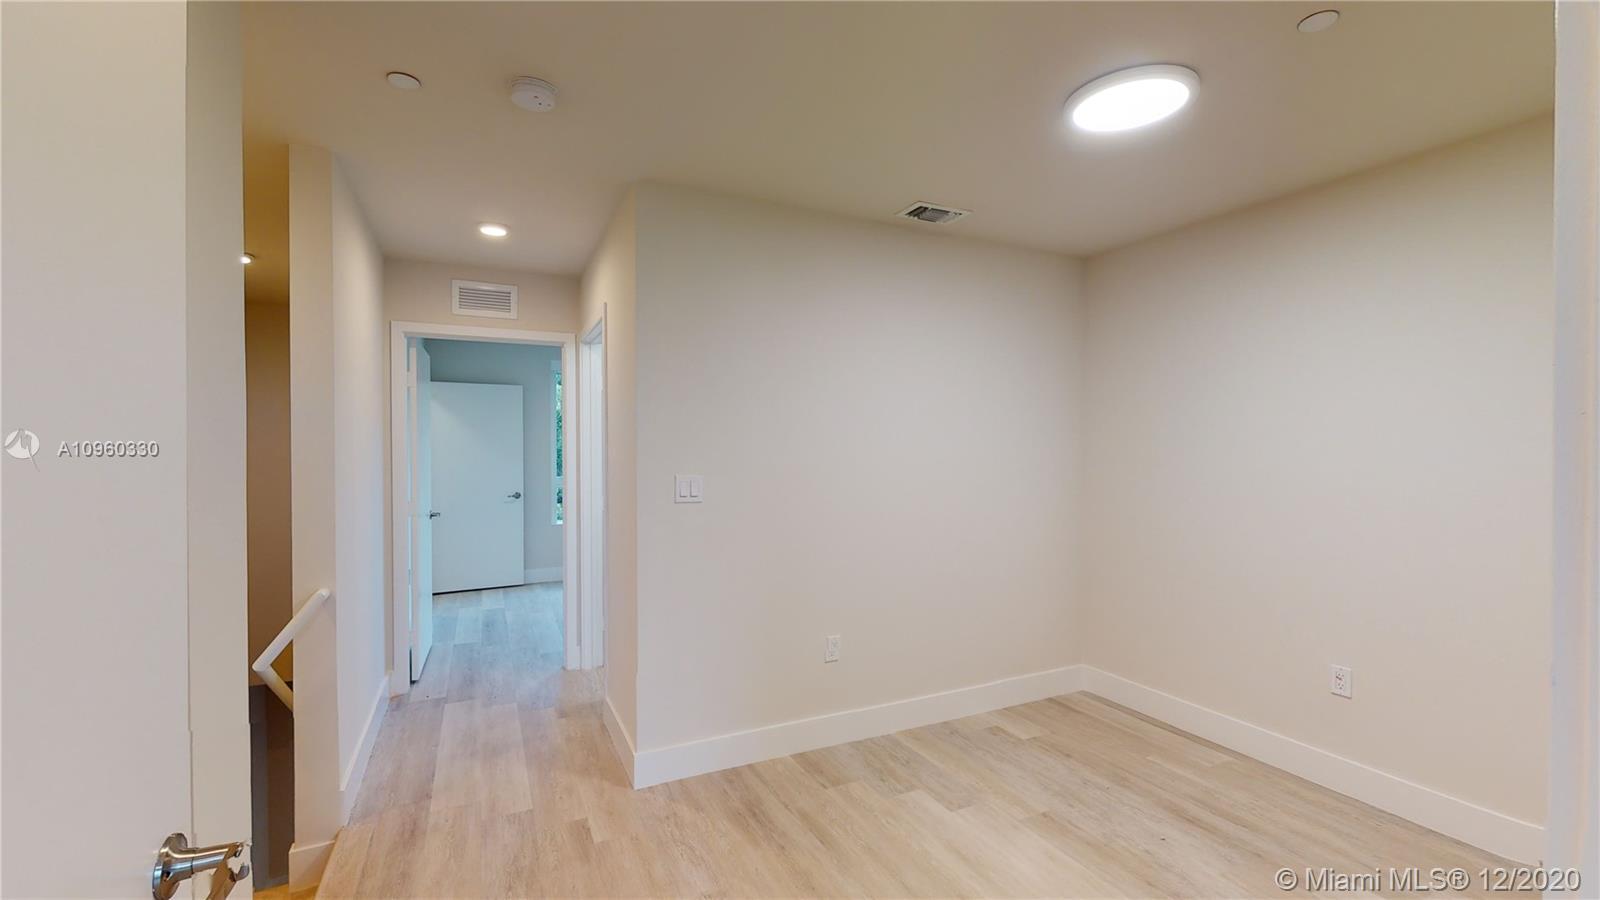 2535 NE 193 Street # 2225, Miami, Florida 33180, 2 Bedrooms Bedrooms, ,3 BathroomsBathrooms,Residential Lease,For Rent,2535 NE 193 Street # 2225,A10960330